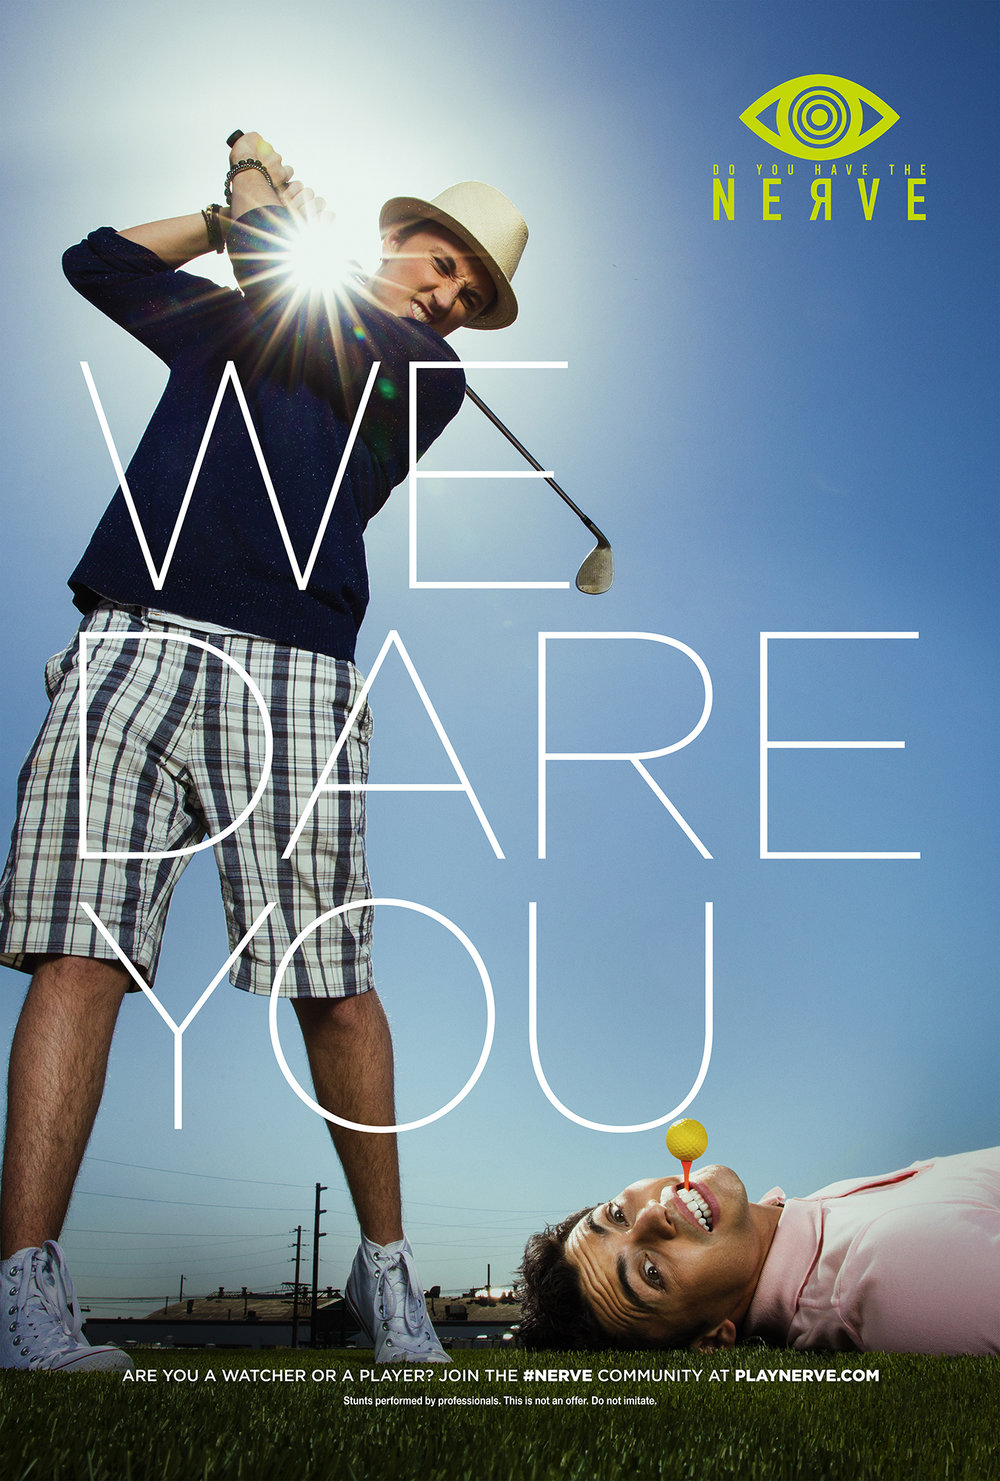 Nerve_1Sht_Dare_Golf_Trim_100dpi.jpg